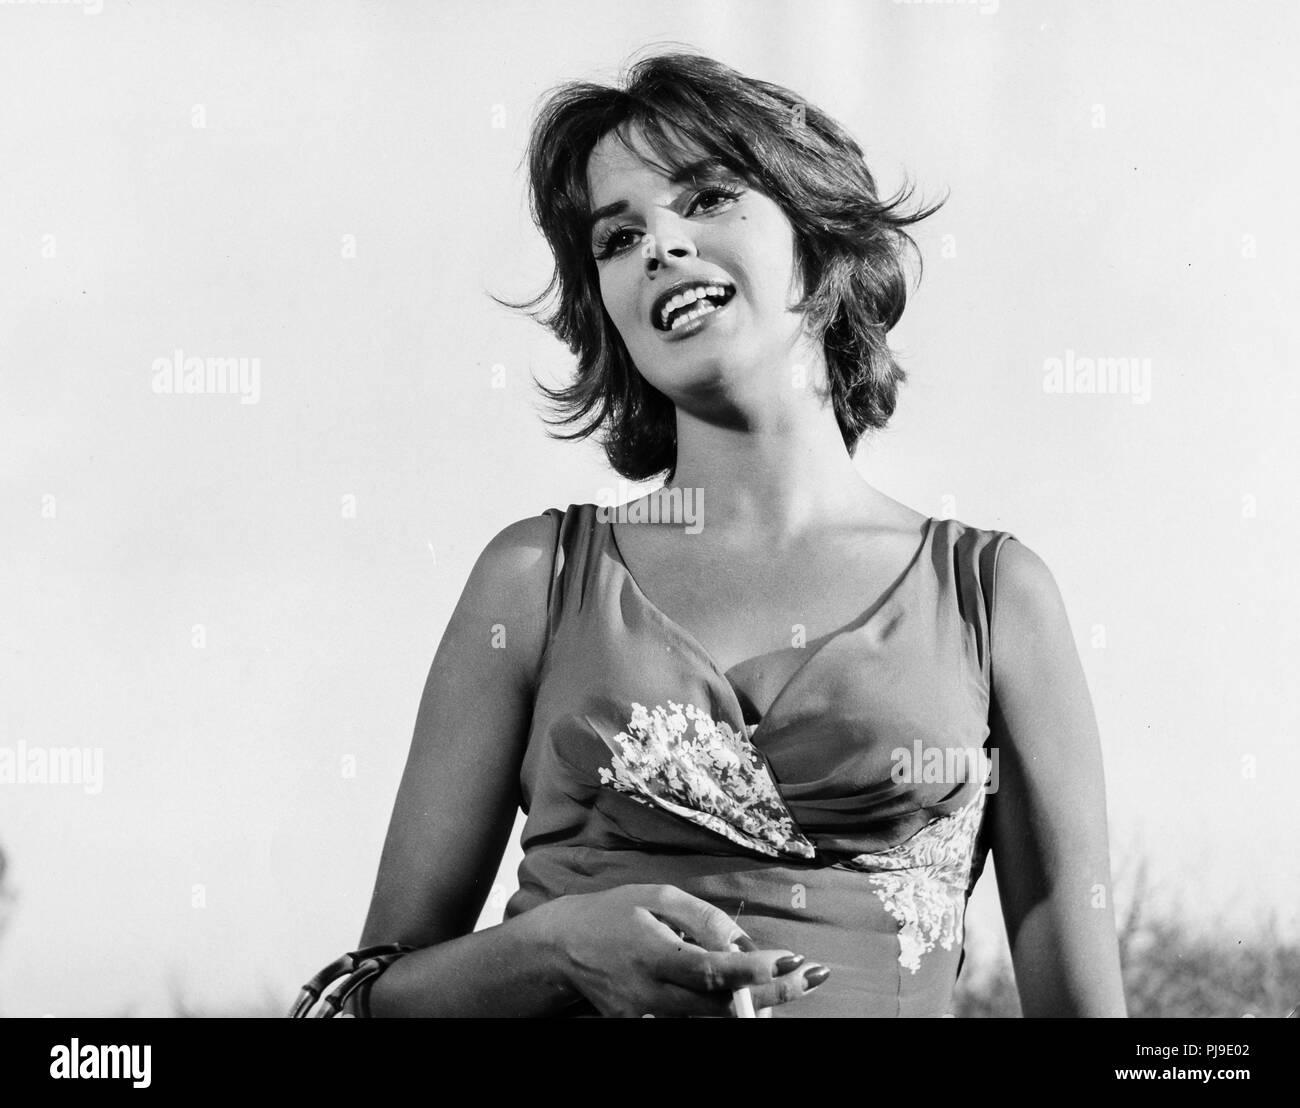 antonella lualdi, bad girls don't cry, 1959 - Stock Image